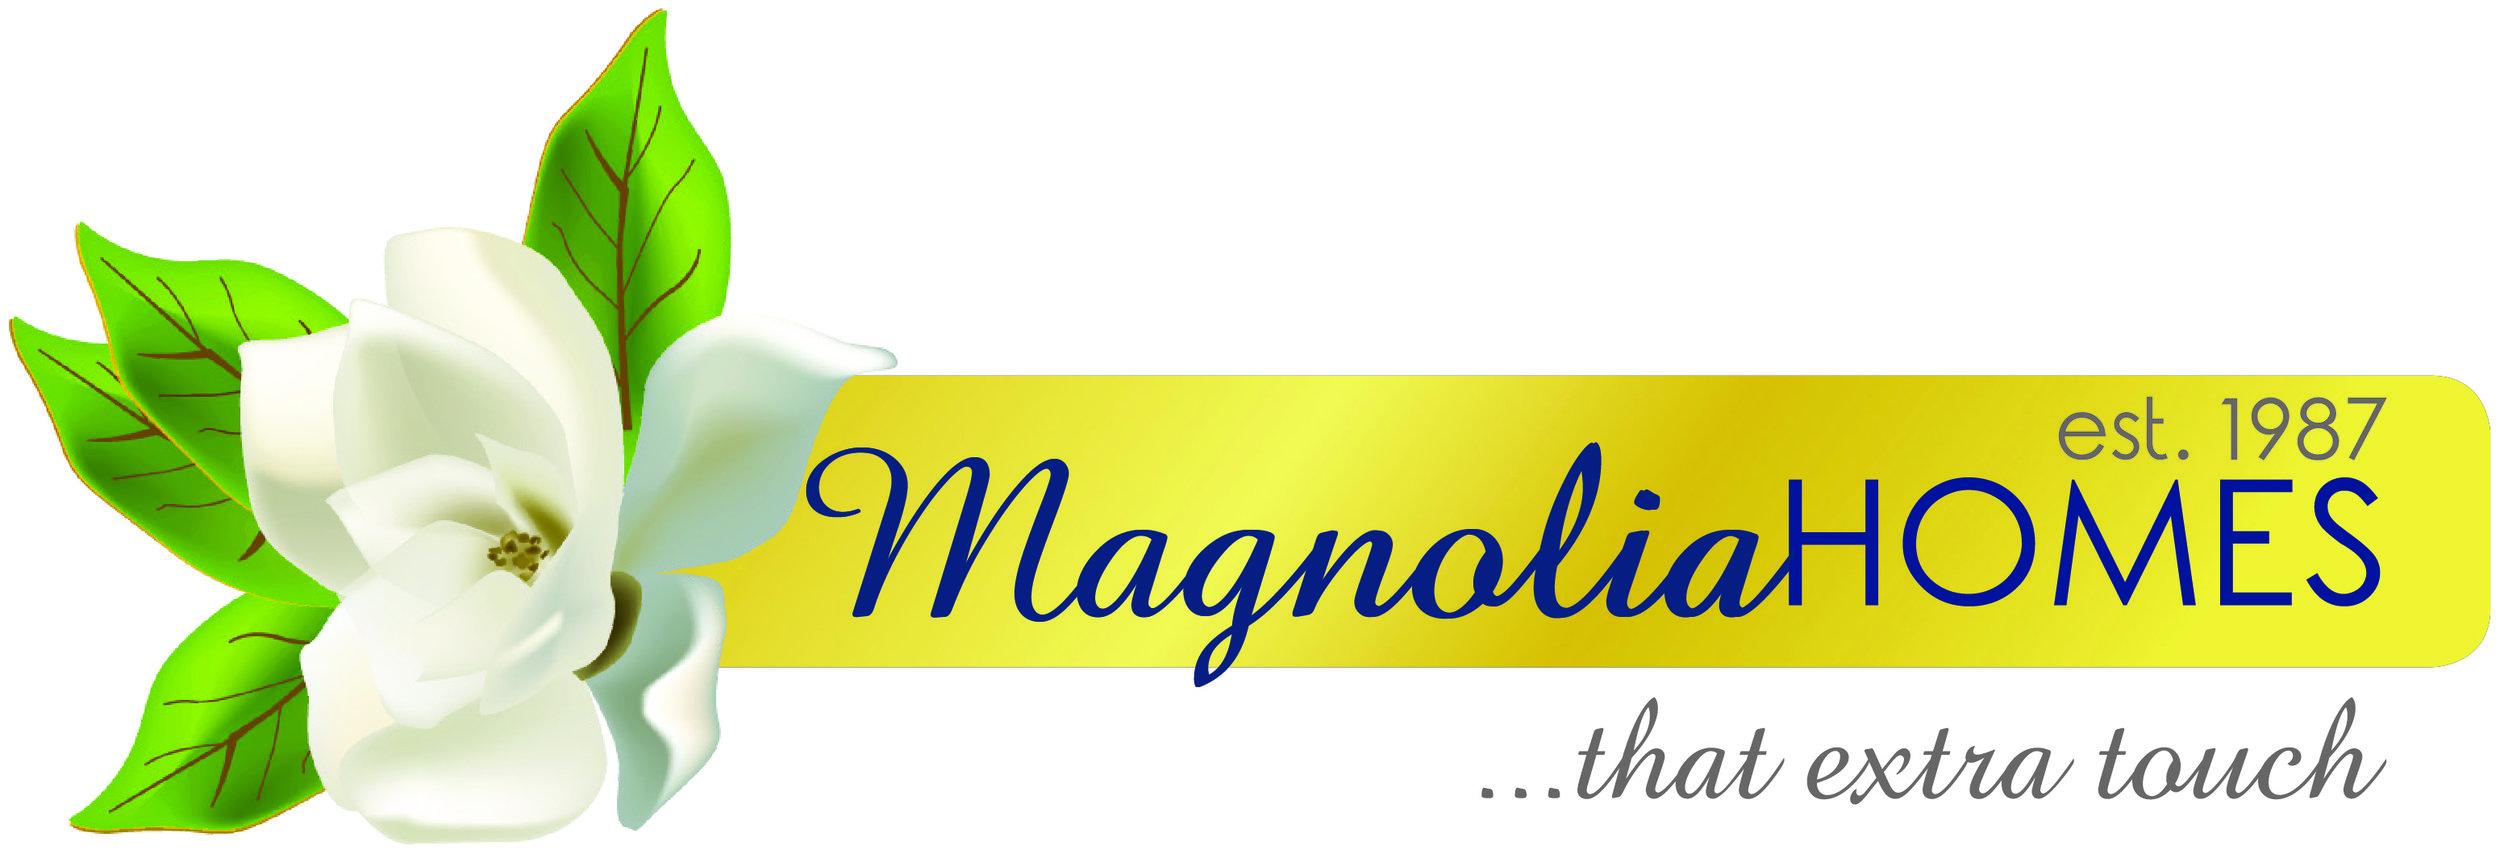 Magnolia Homes JPG.JPG